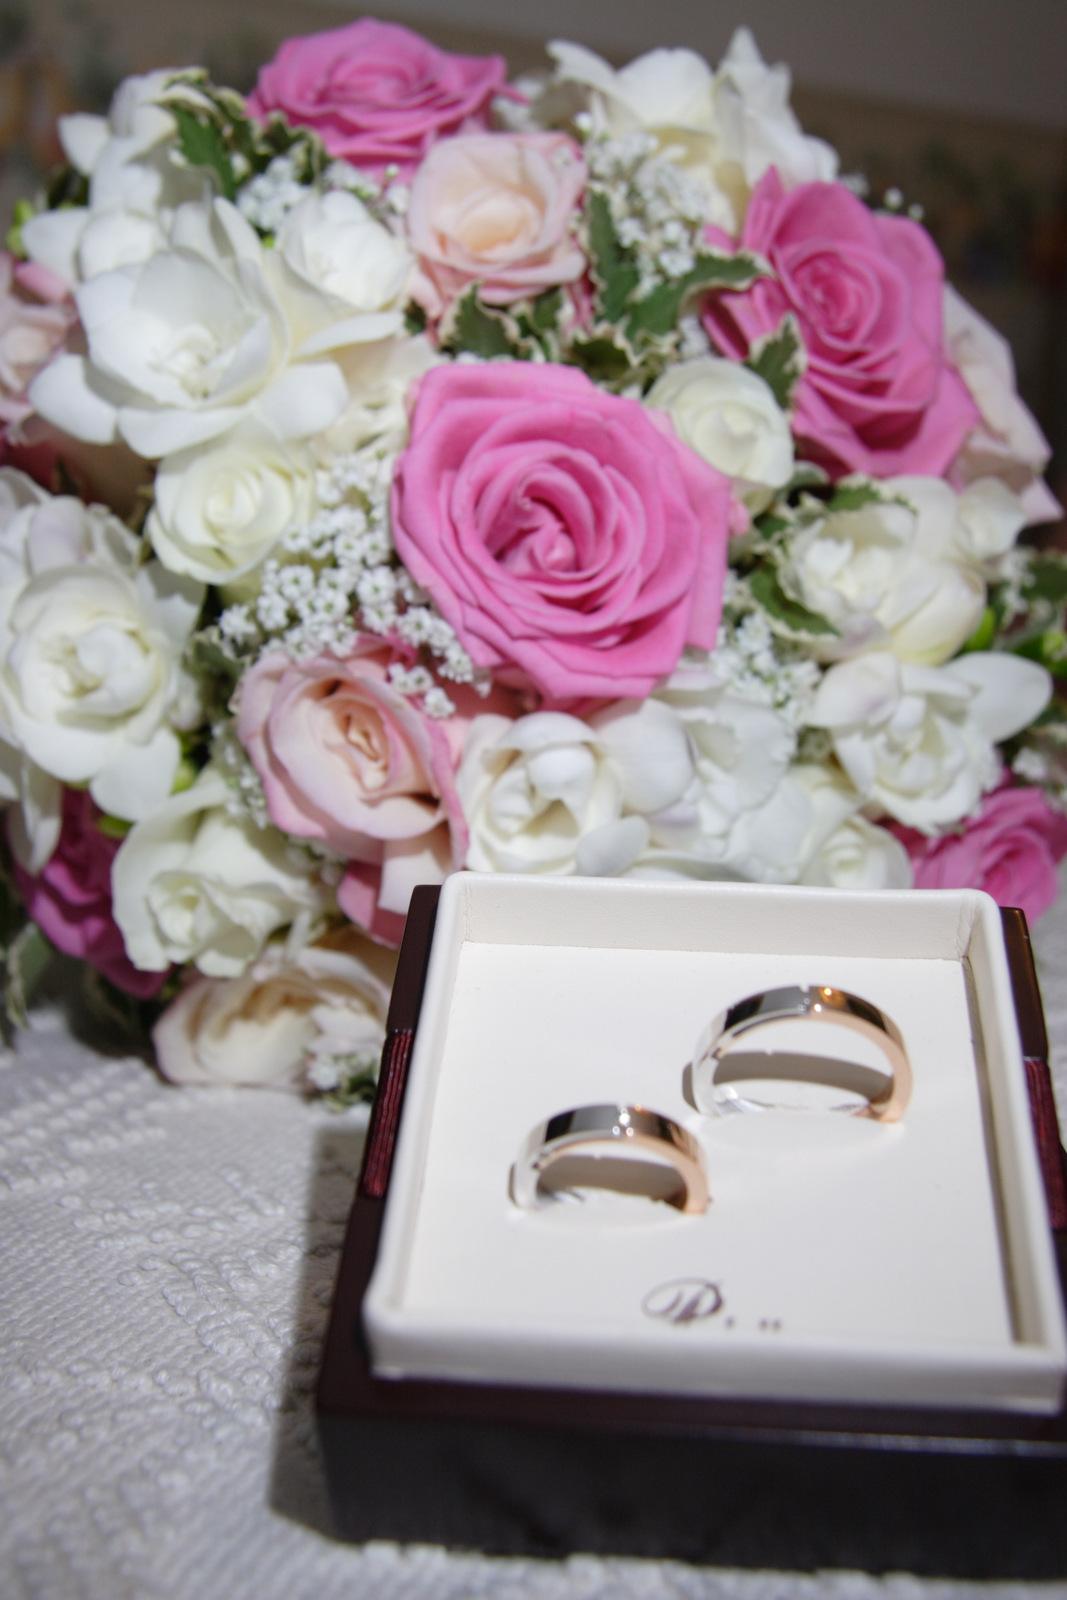 Anniversario Di Matrimonio Auguri Immagini : ° anniversario di matrimonio immagini